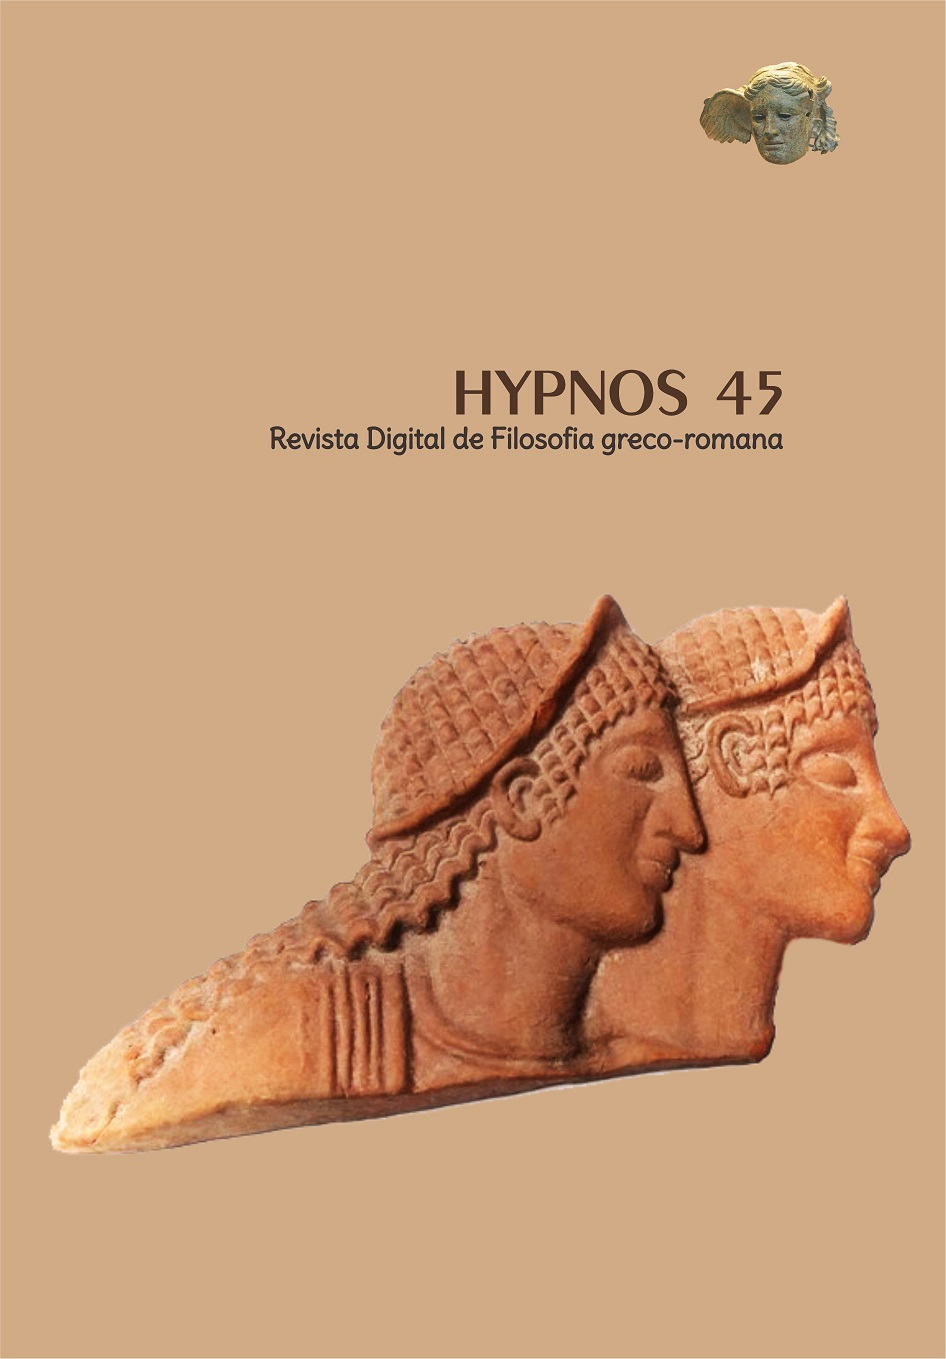 Capa: Cover: escultura antiga em terra cota